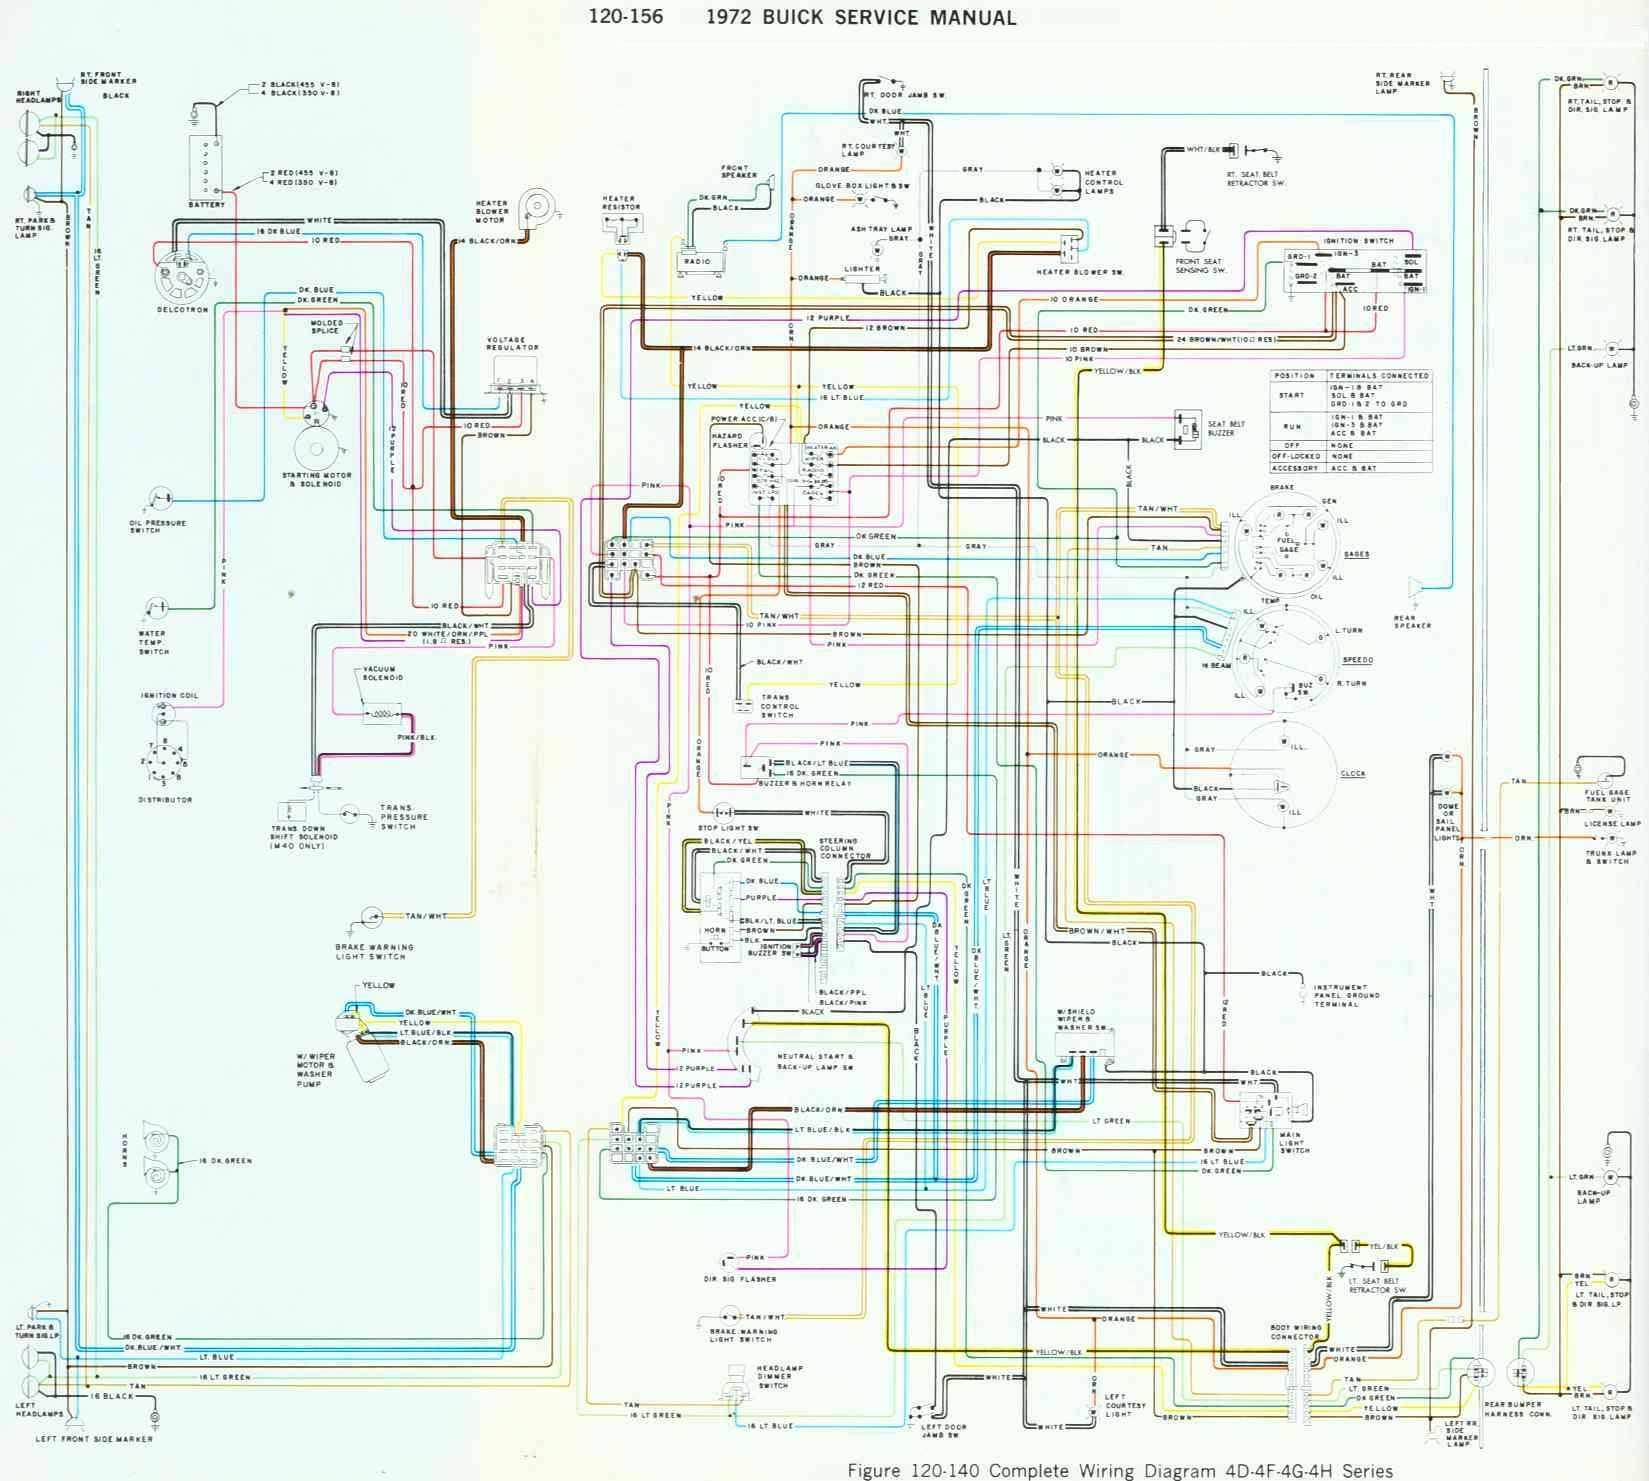 1972 skylark wiring diagram wiring diagram dash 1974 buick skylark 1972 skylark wiring diagram #3